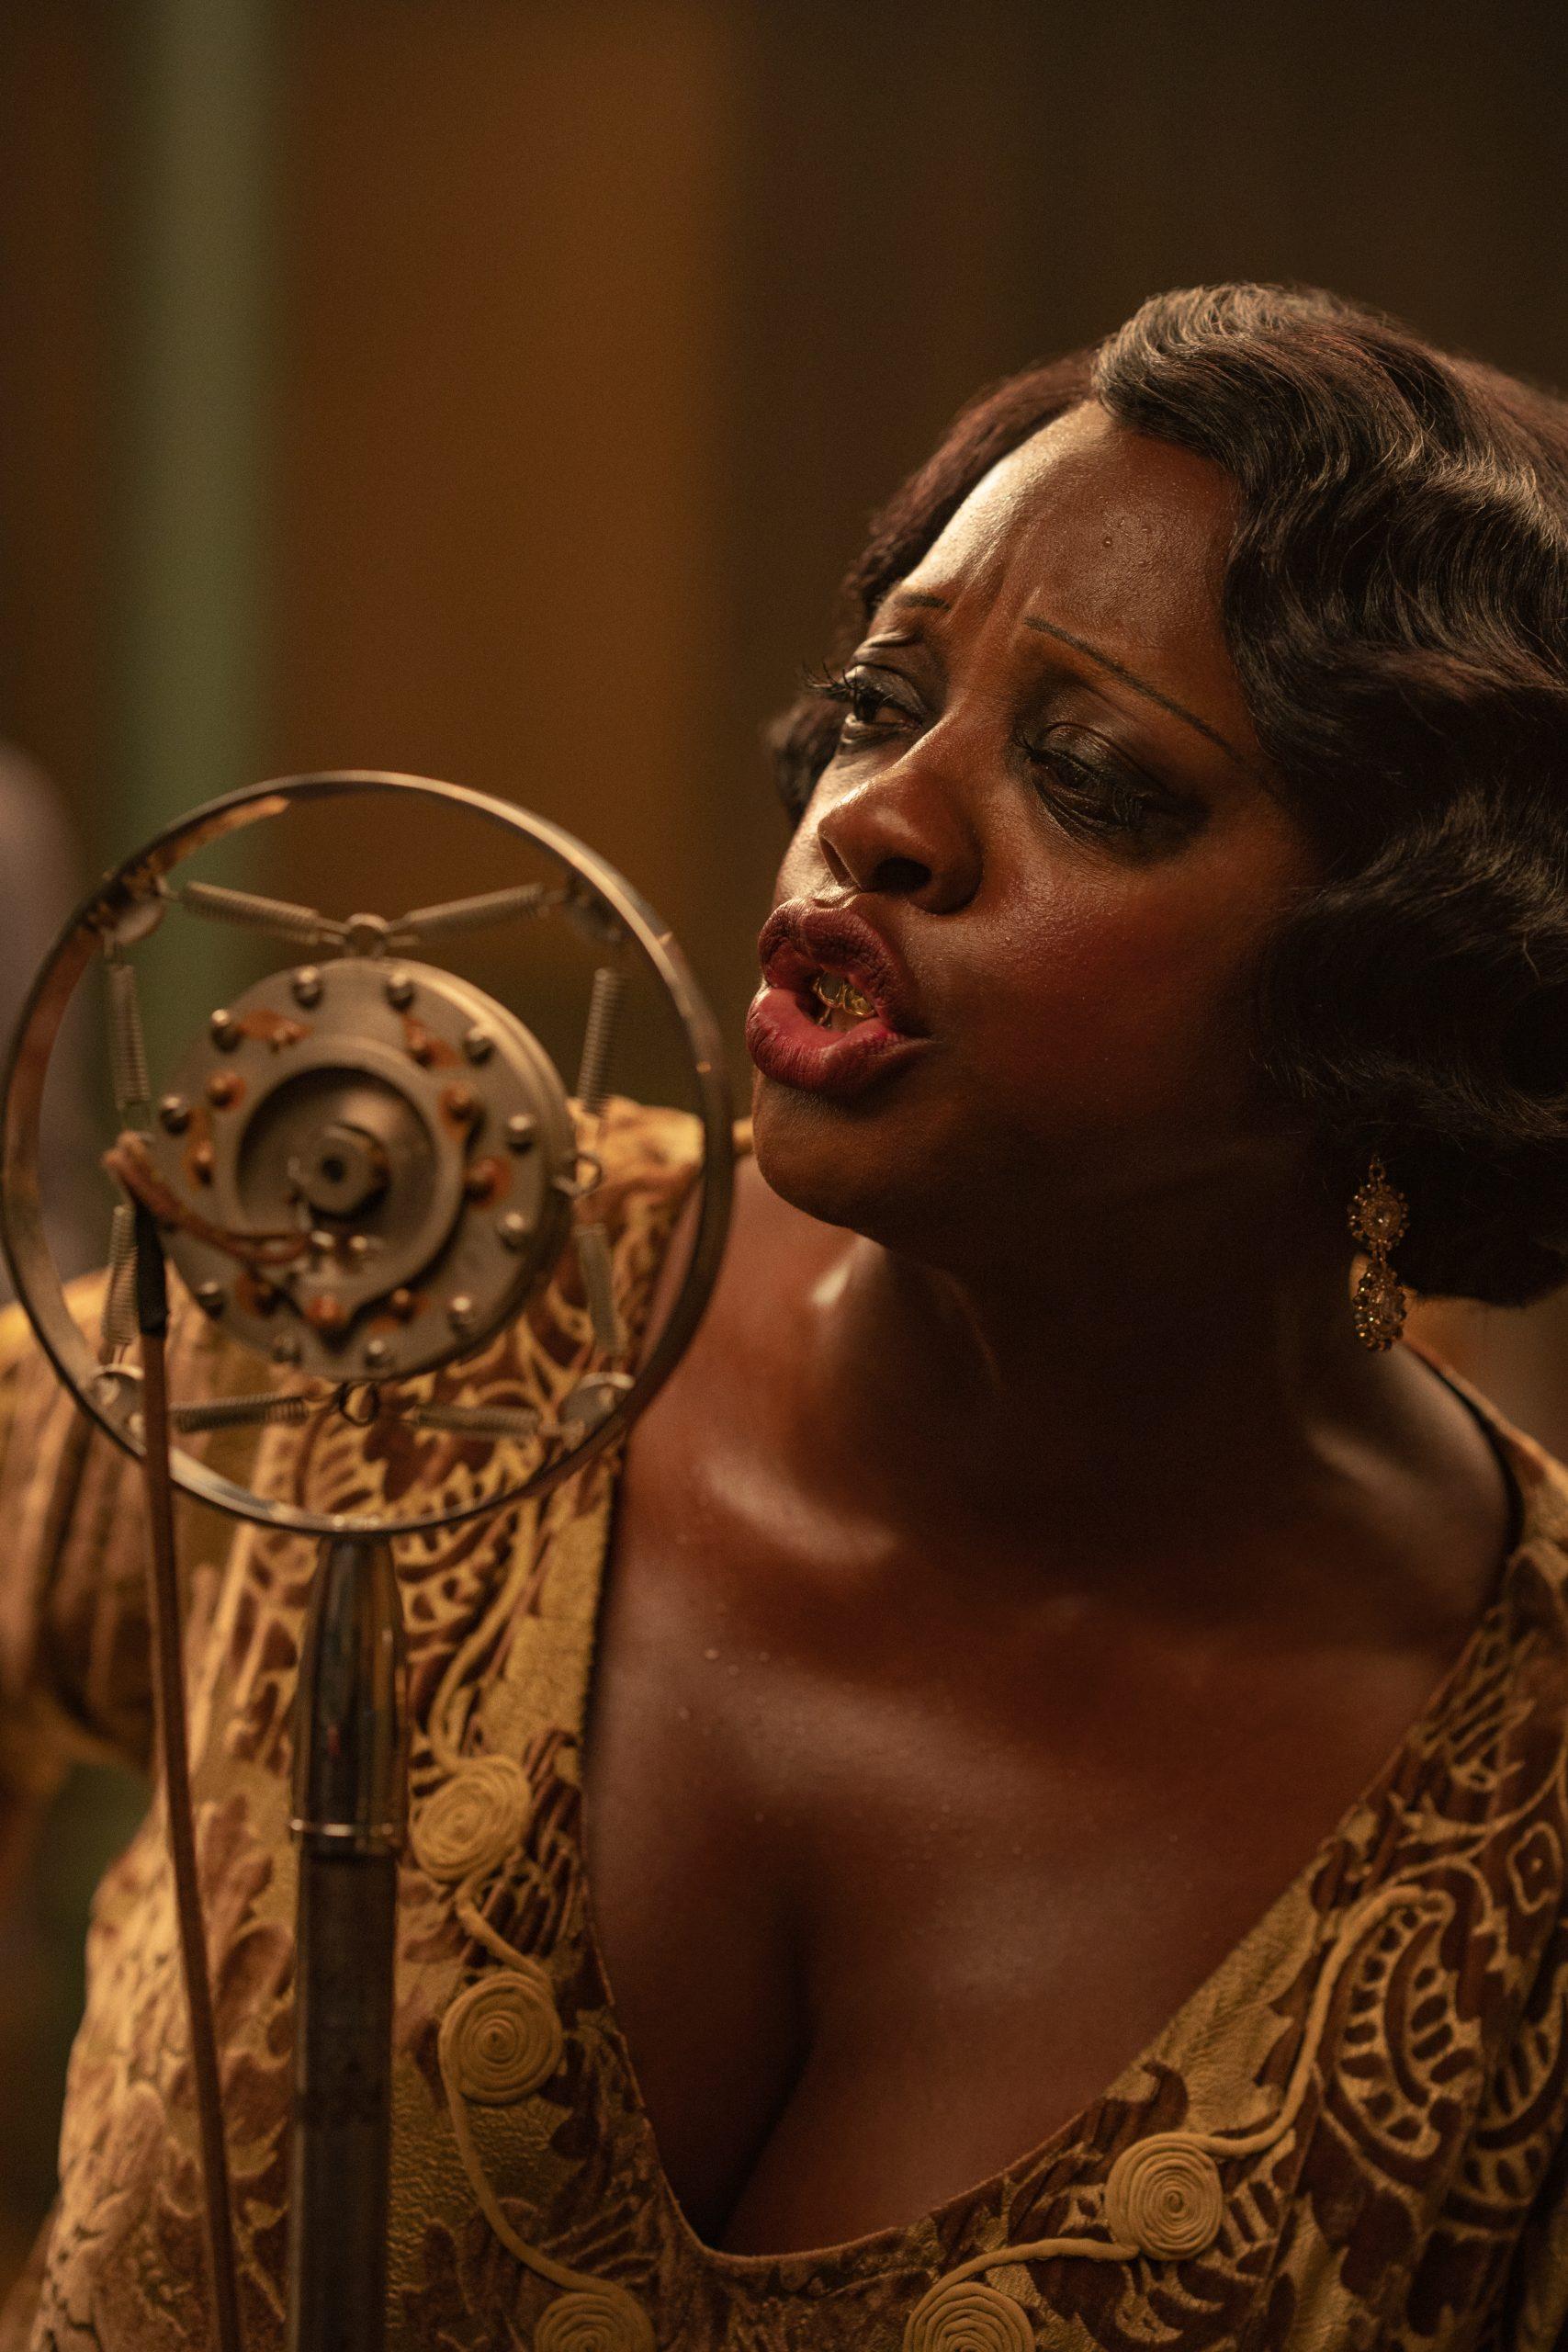 Viola Davis as Ma Rainey in 'Ma Rainey's Black Bottom' on Netflix. (David Lee / Netflix)